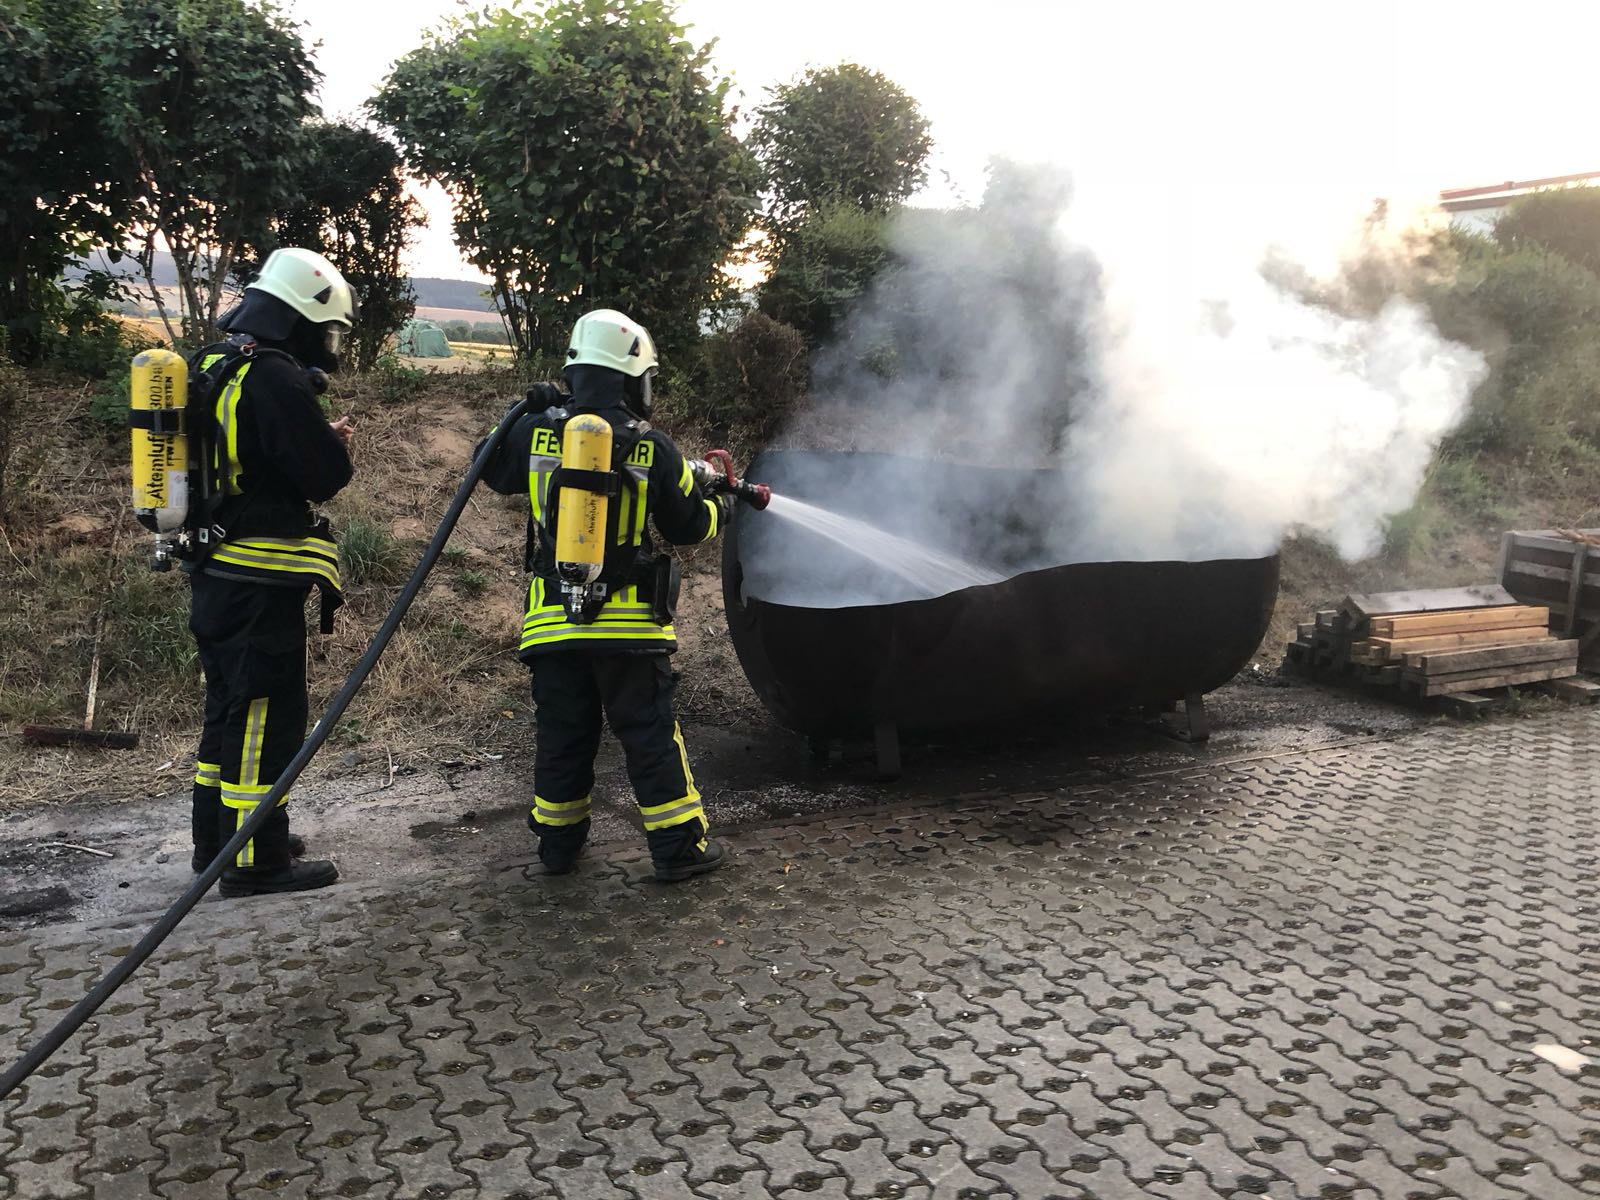 F1 brennt Gerümpel im freien